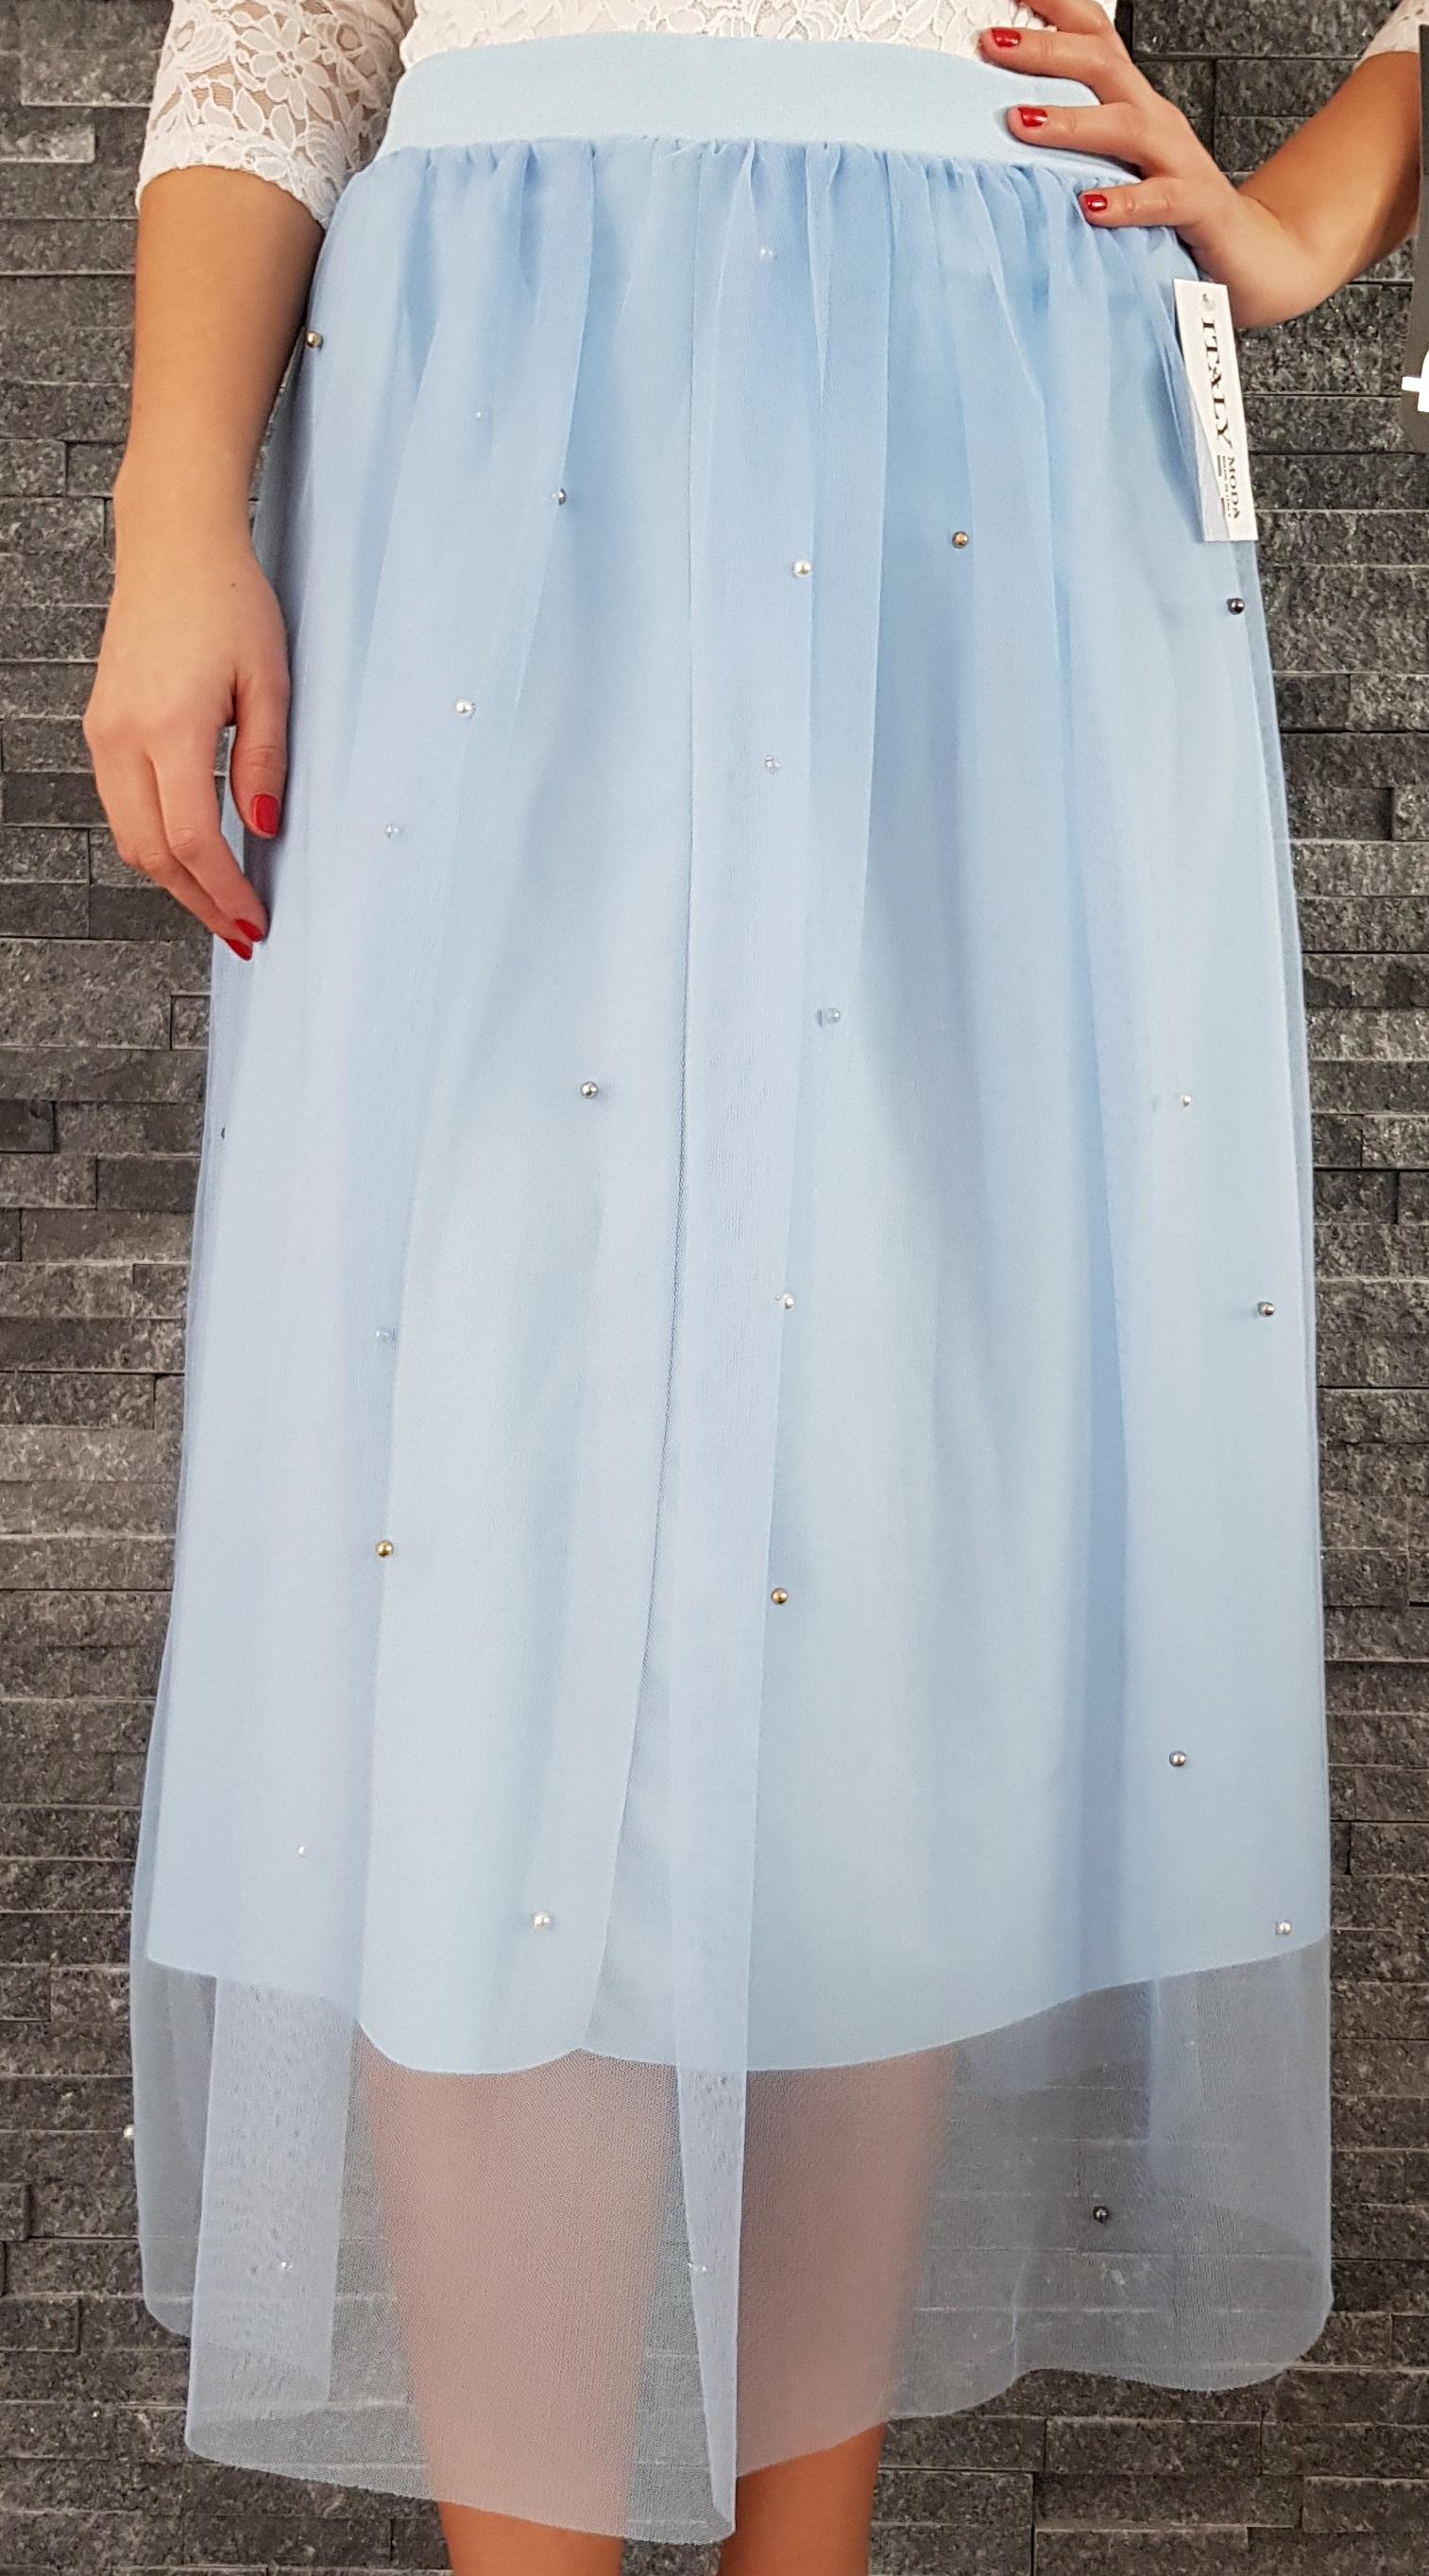 Modrá tylová MIDI sukňa s perličkami 591746c1d1